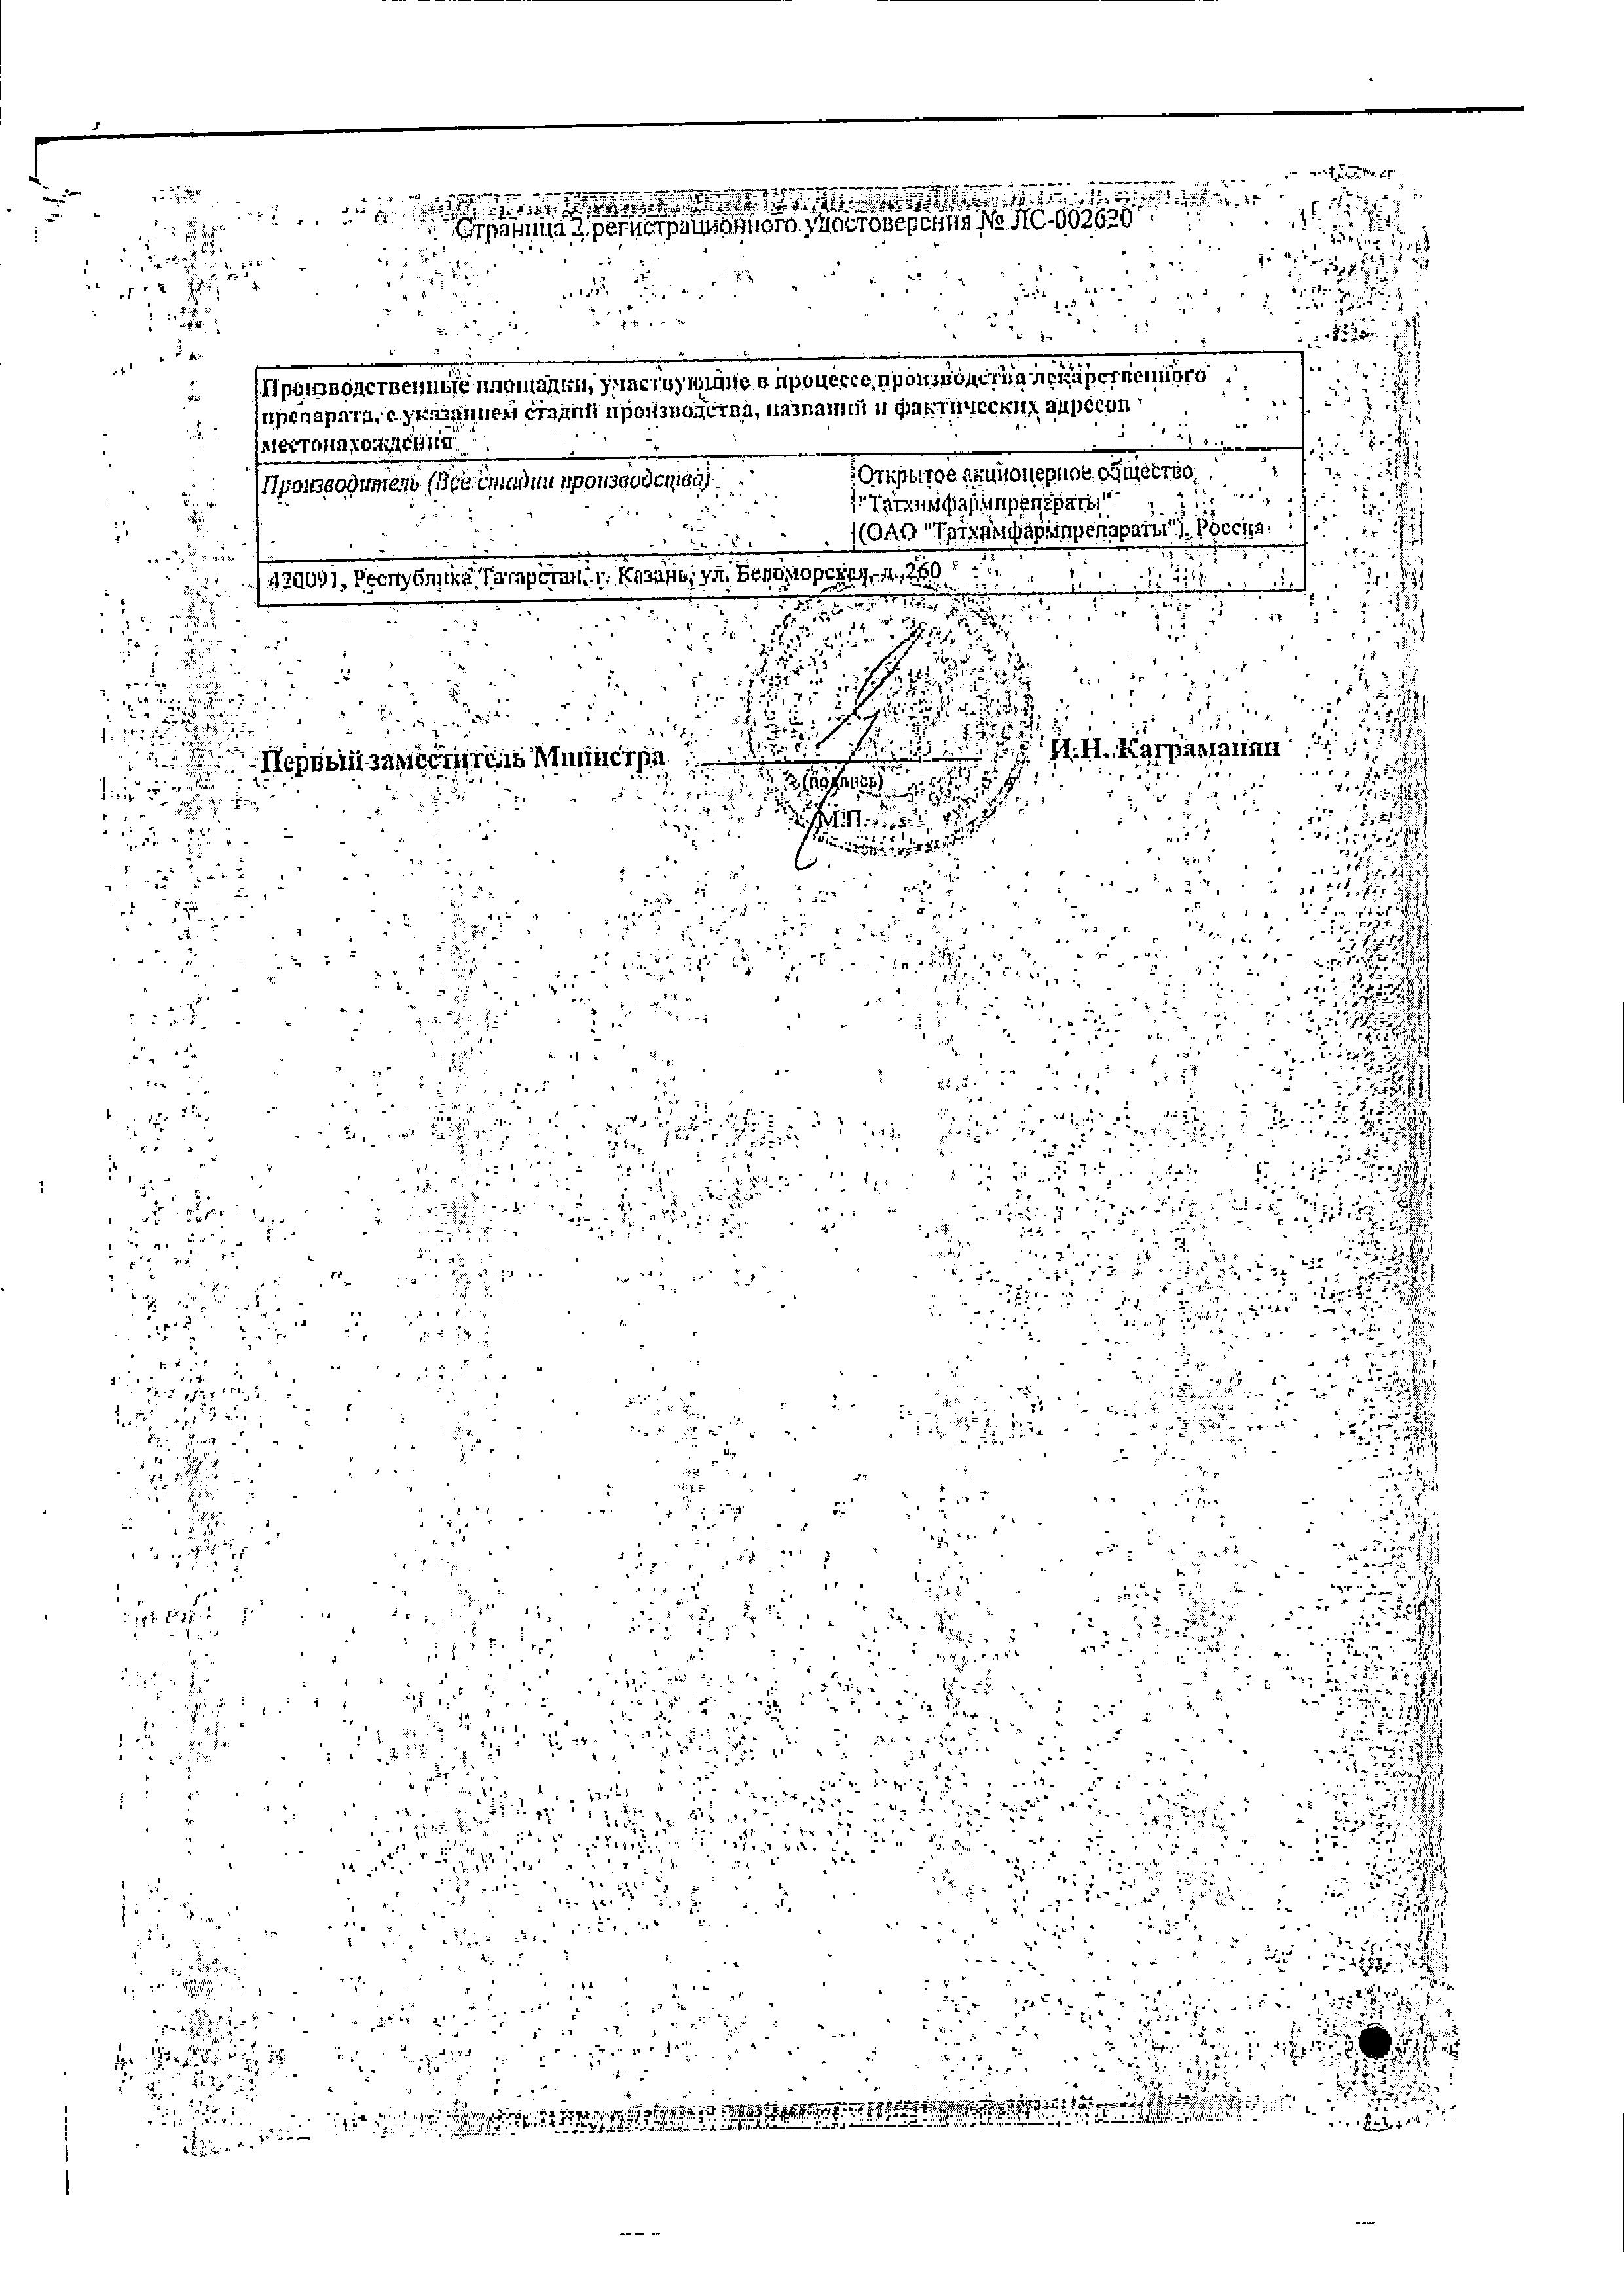 Димефосфон сертификат